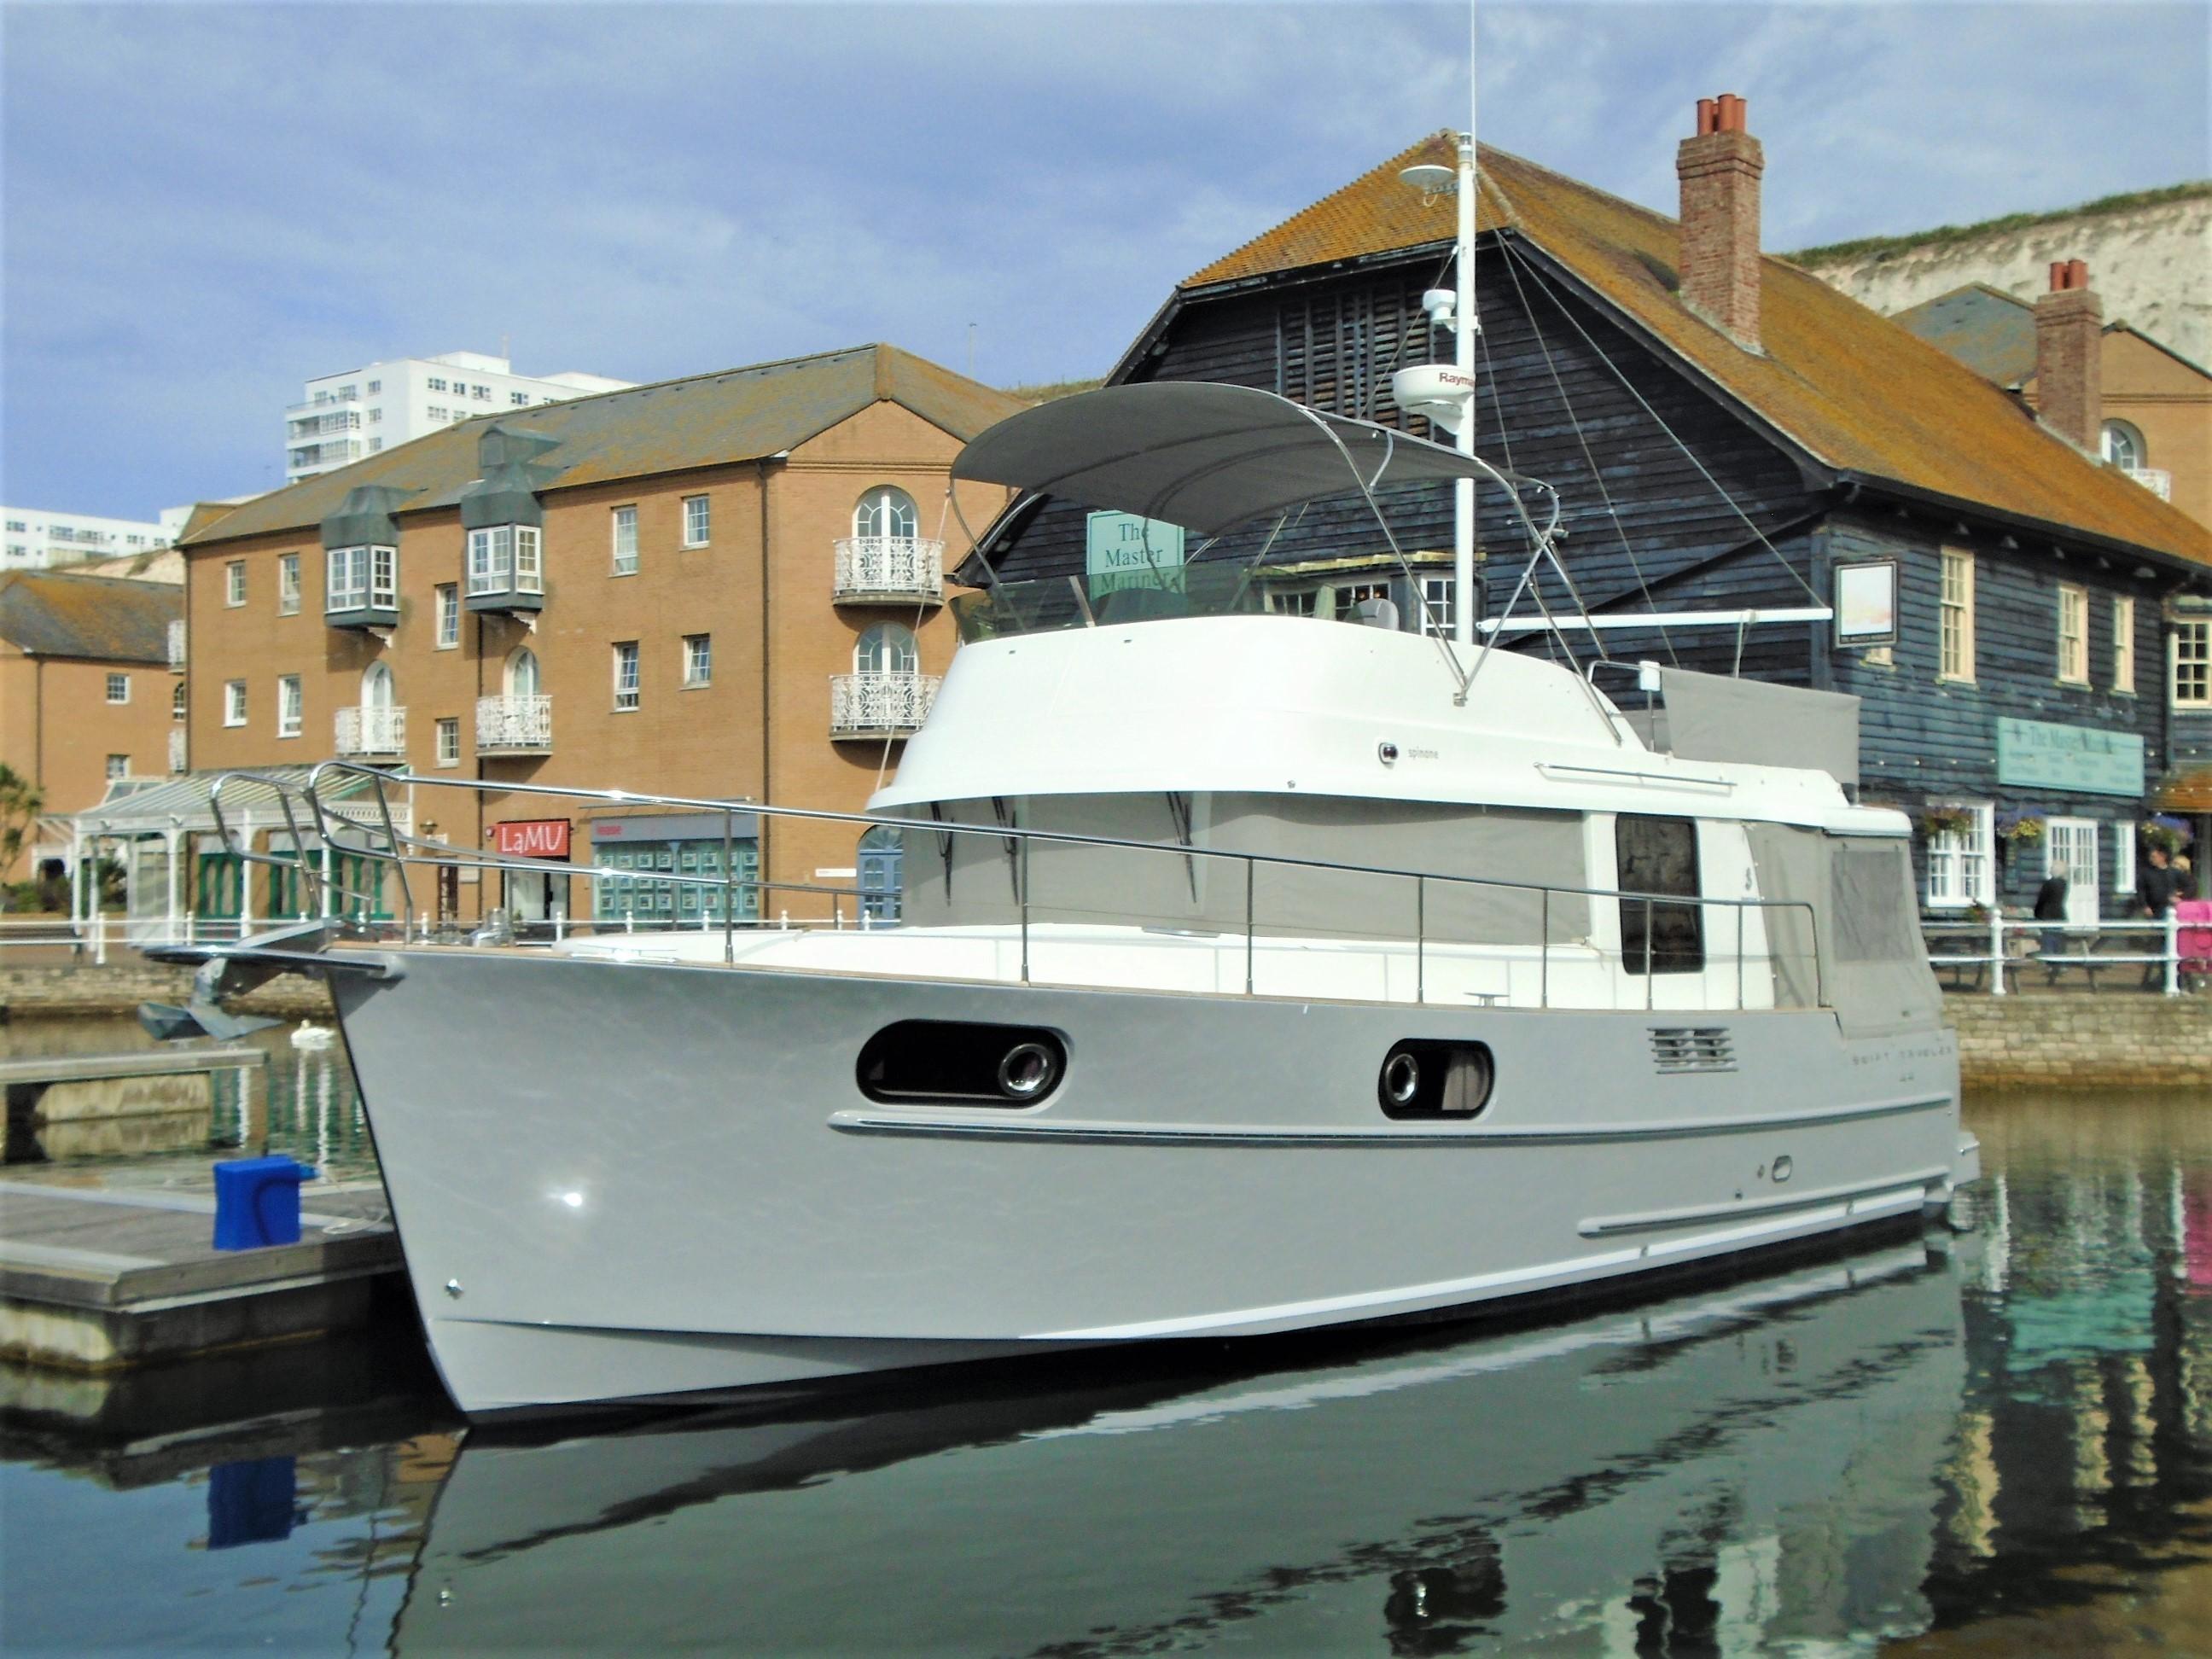 Beneteau Swift Trawler 44 Beneteau Swift Trawler 44 2012